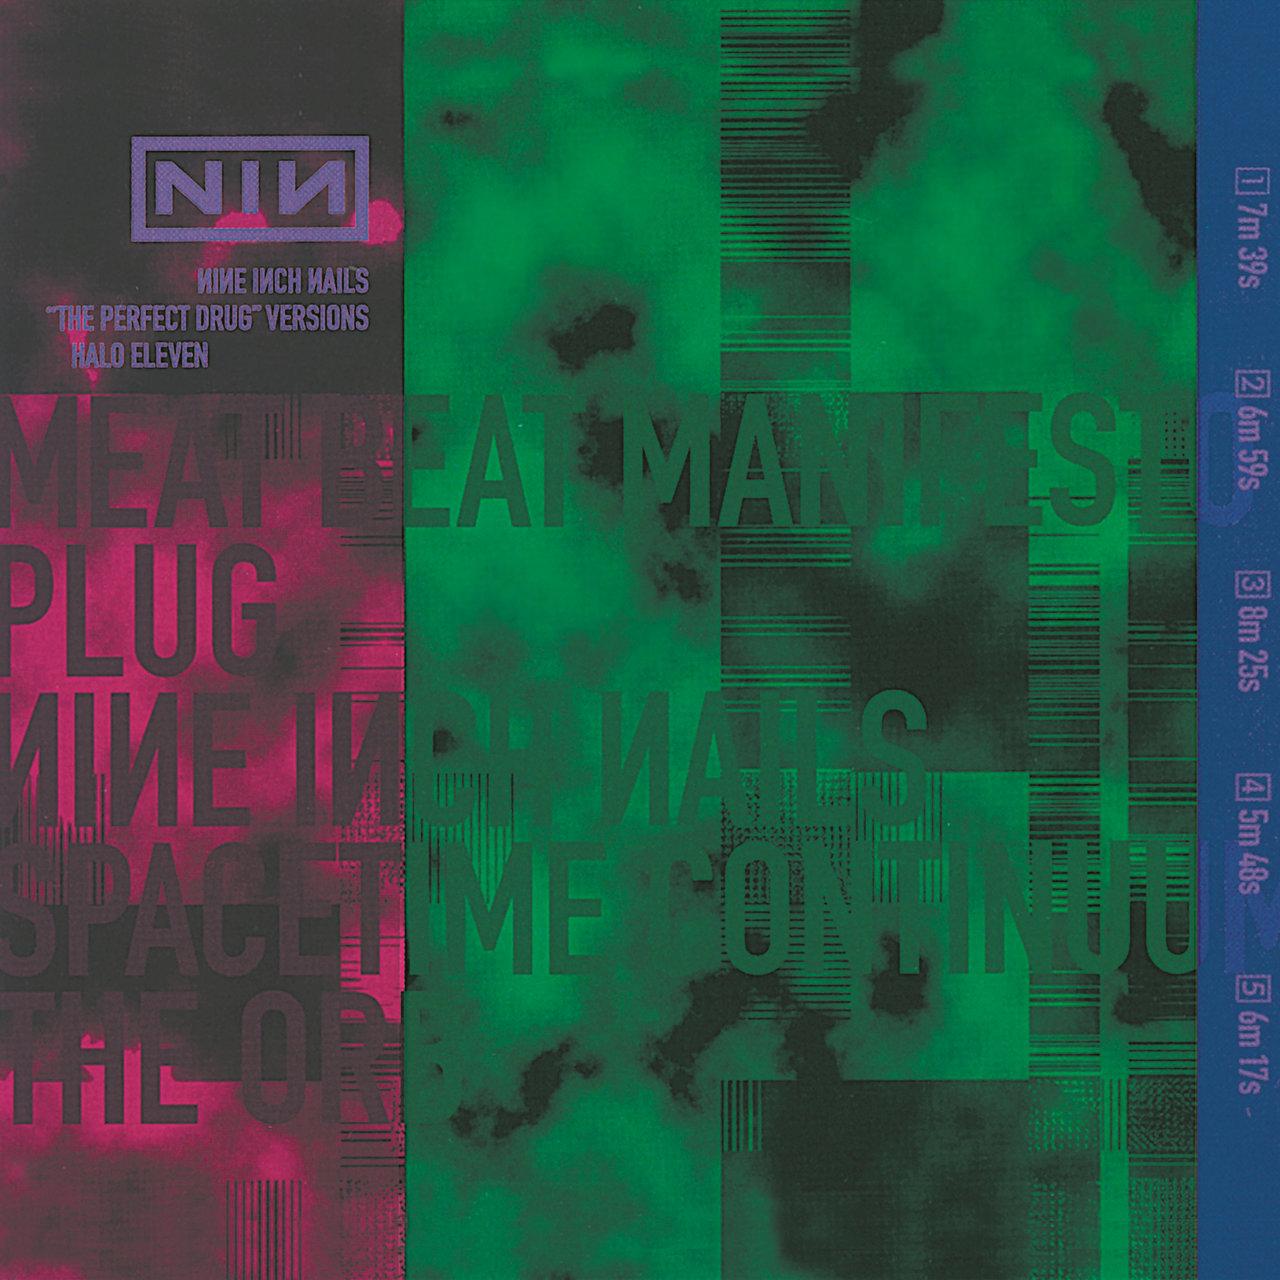 TIDAL: Listen to Nine Inch Nails on TIDAL